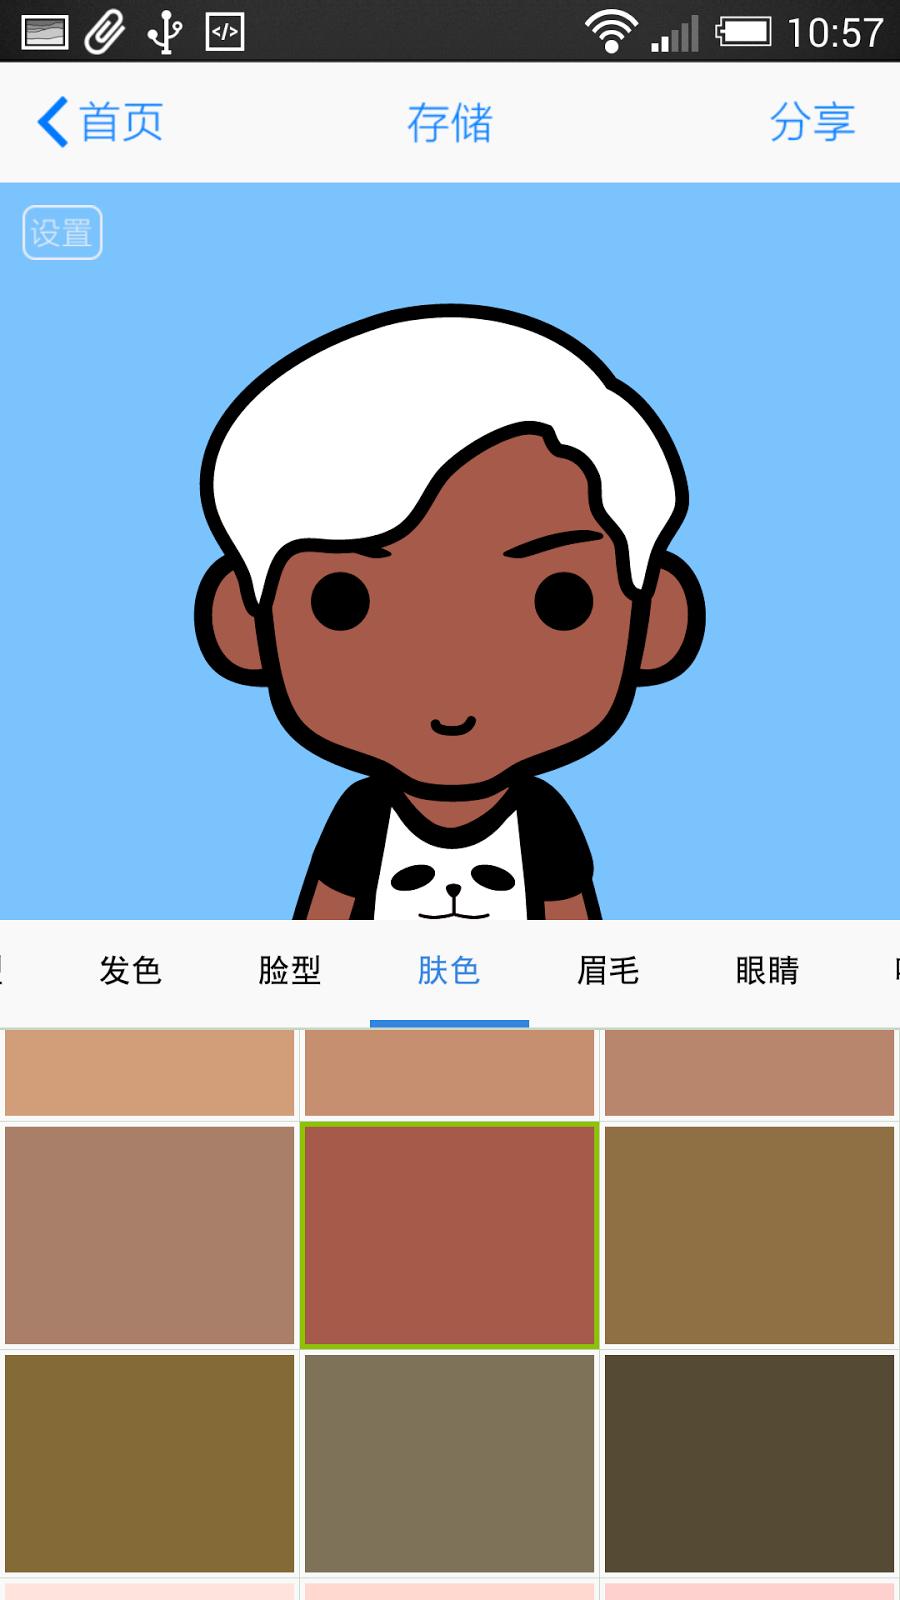 MYOTee臉萌 App 引爆社群換臉風潮的好玩卡通拼貼頭像